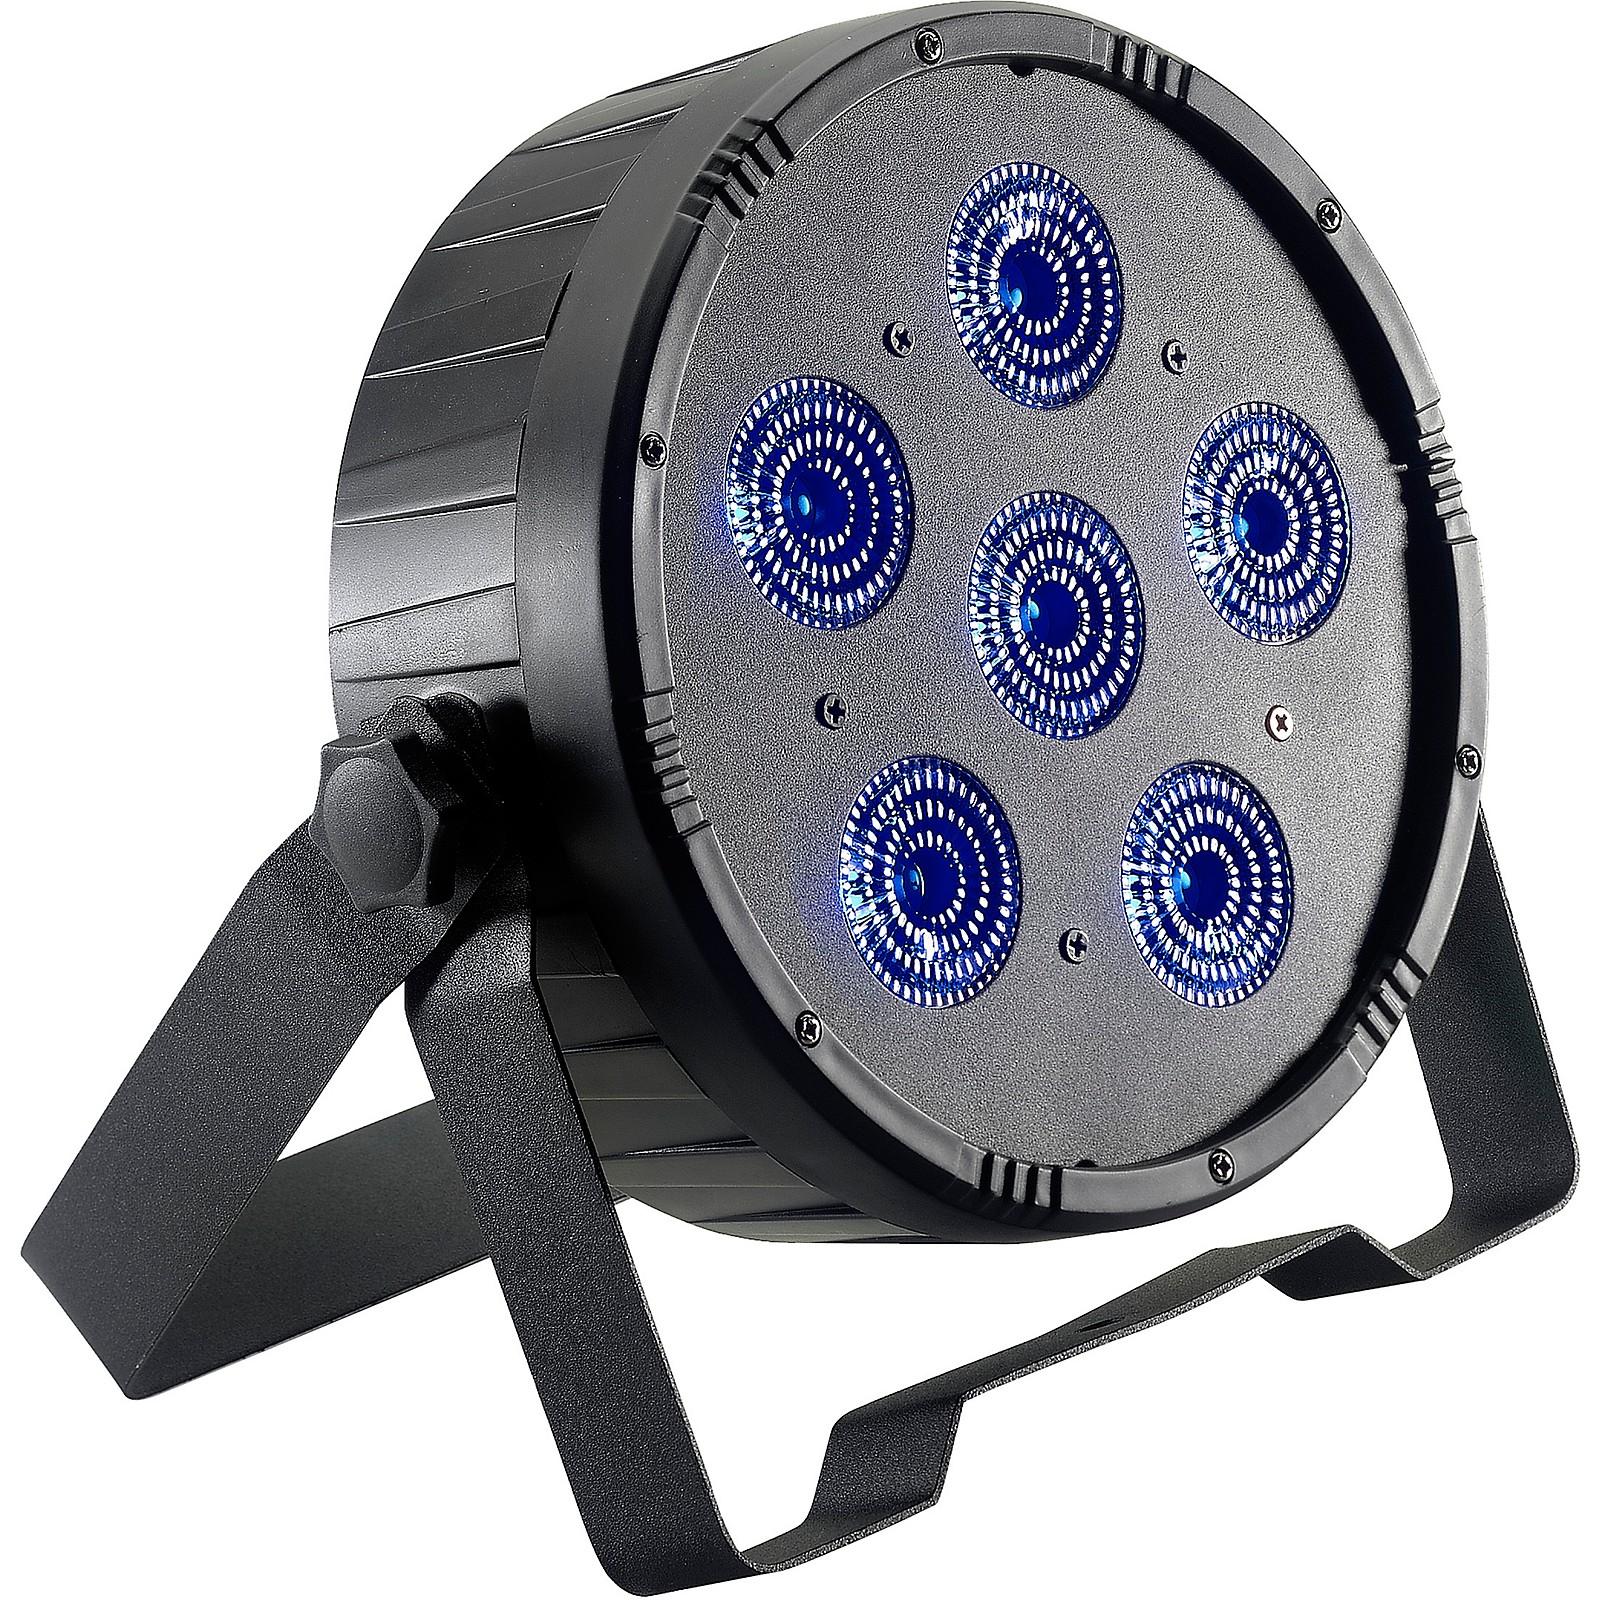 Stagg Flat ECOPAR 6 RGBWA+UV LED Spotlight Wash Light